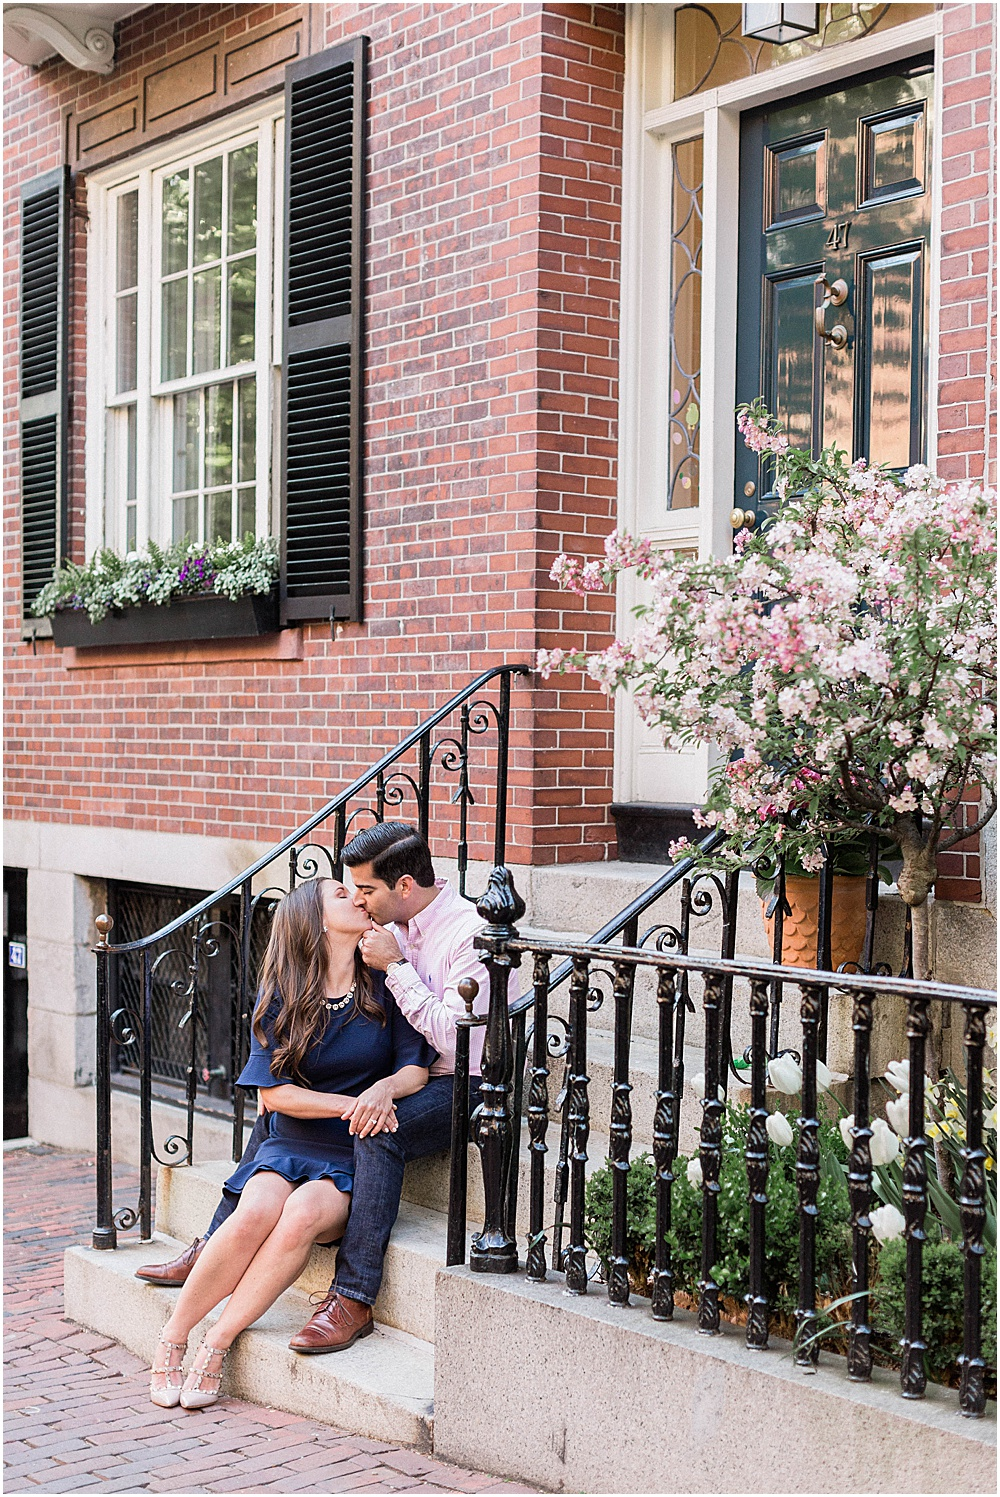 boston_common_cherry_blossoms_spring_engagement_session_boston_wedding_photographer_meredith_jane_photography_photo_0179.jpg